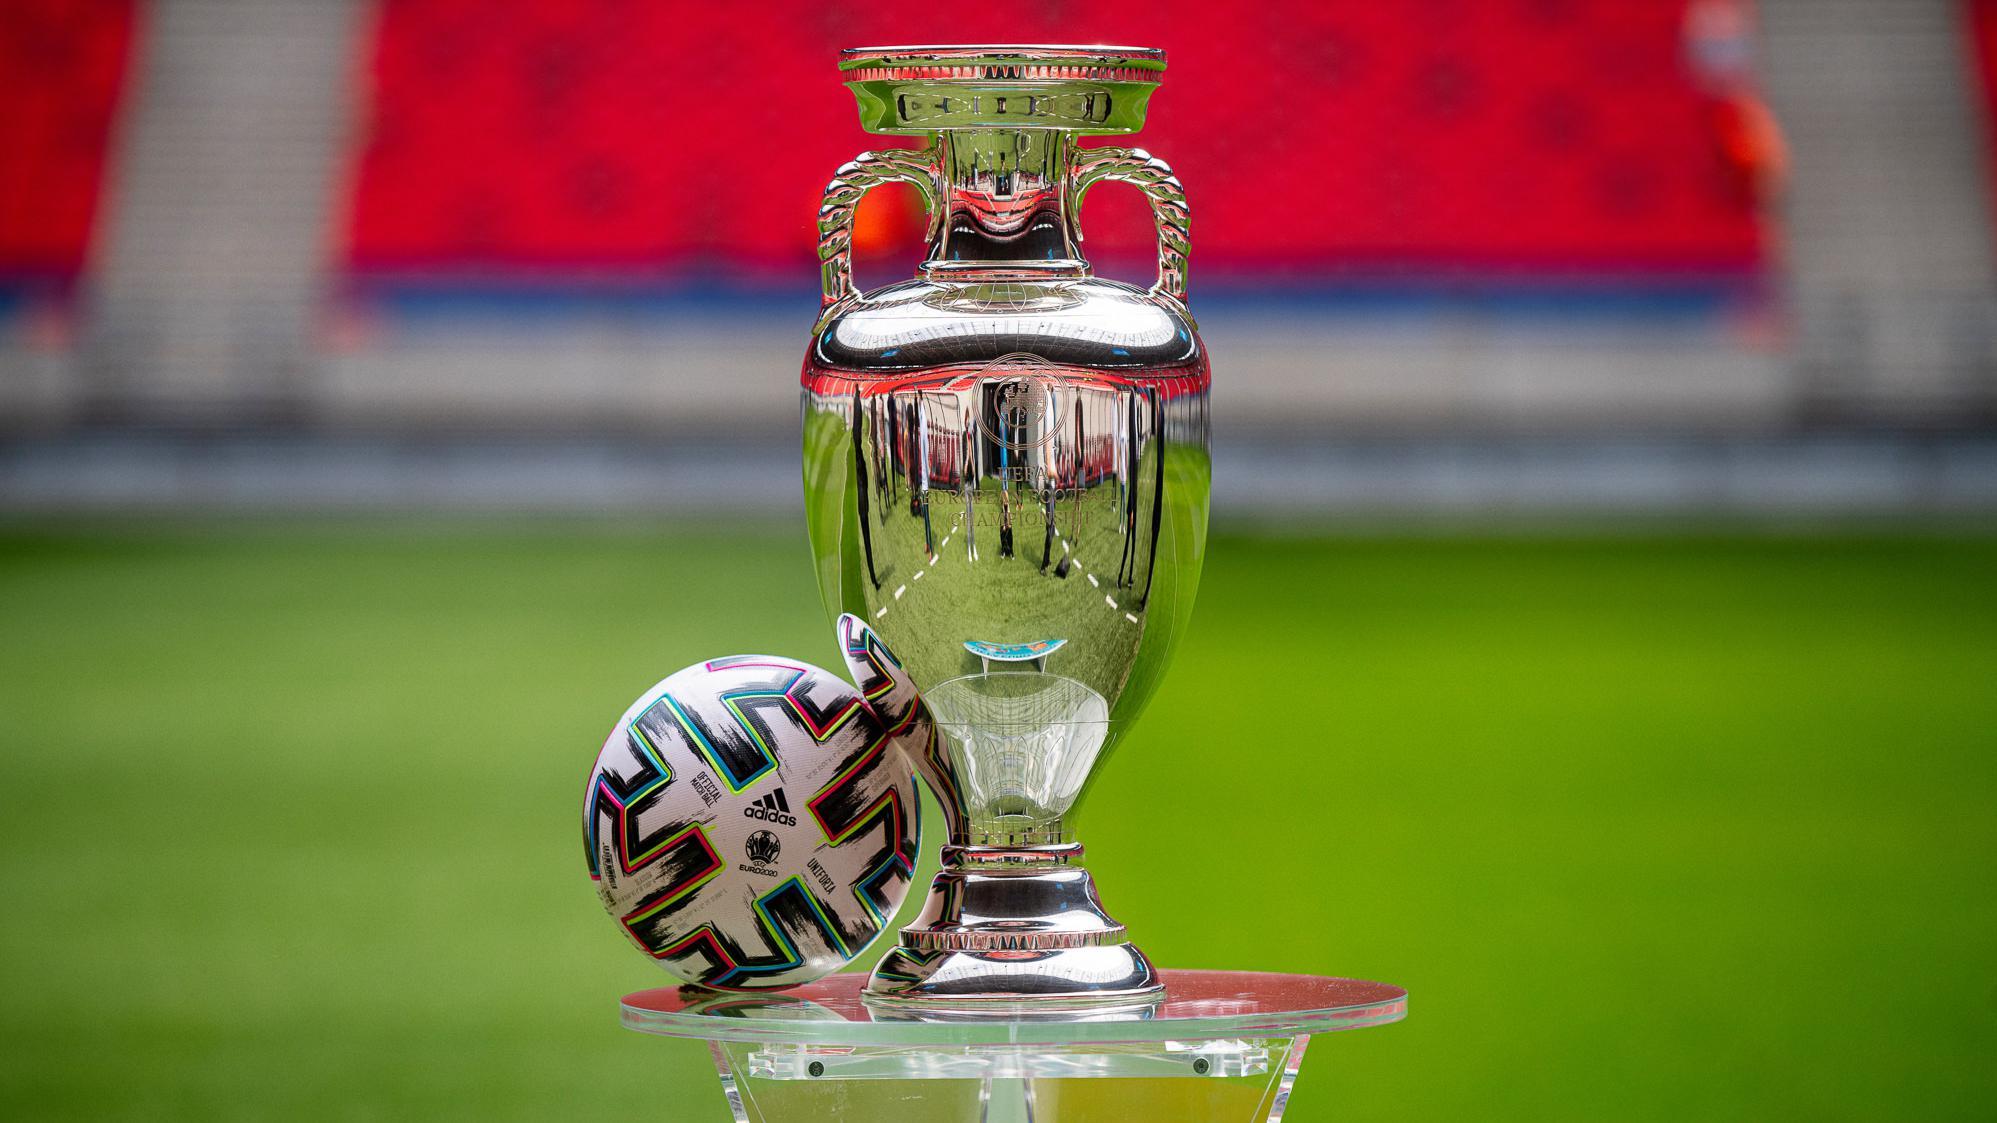 uefa euro 2020 - photo #14